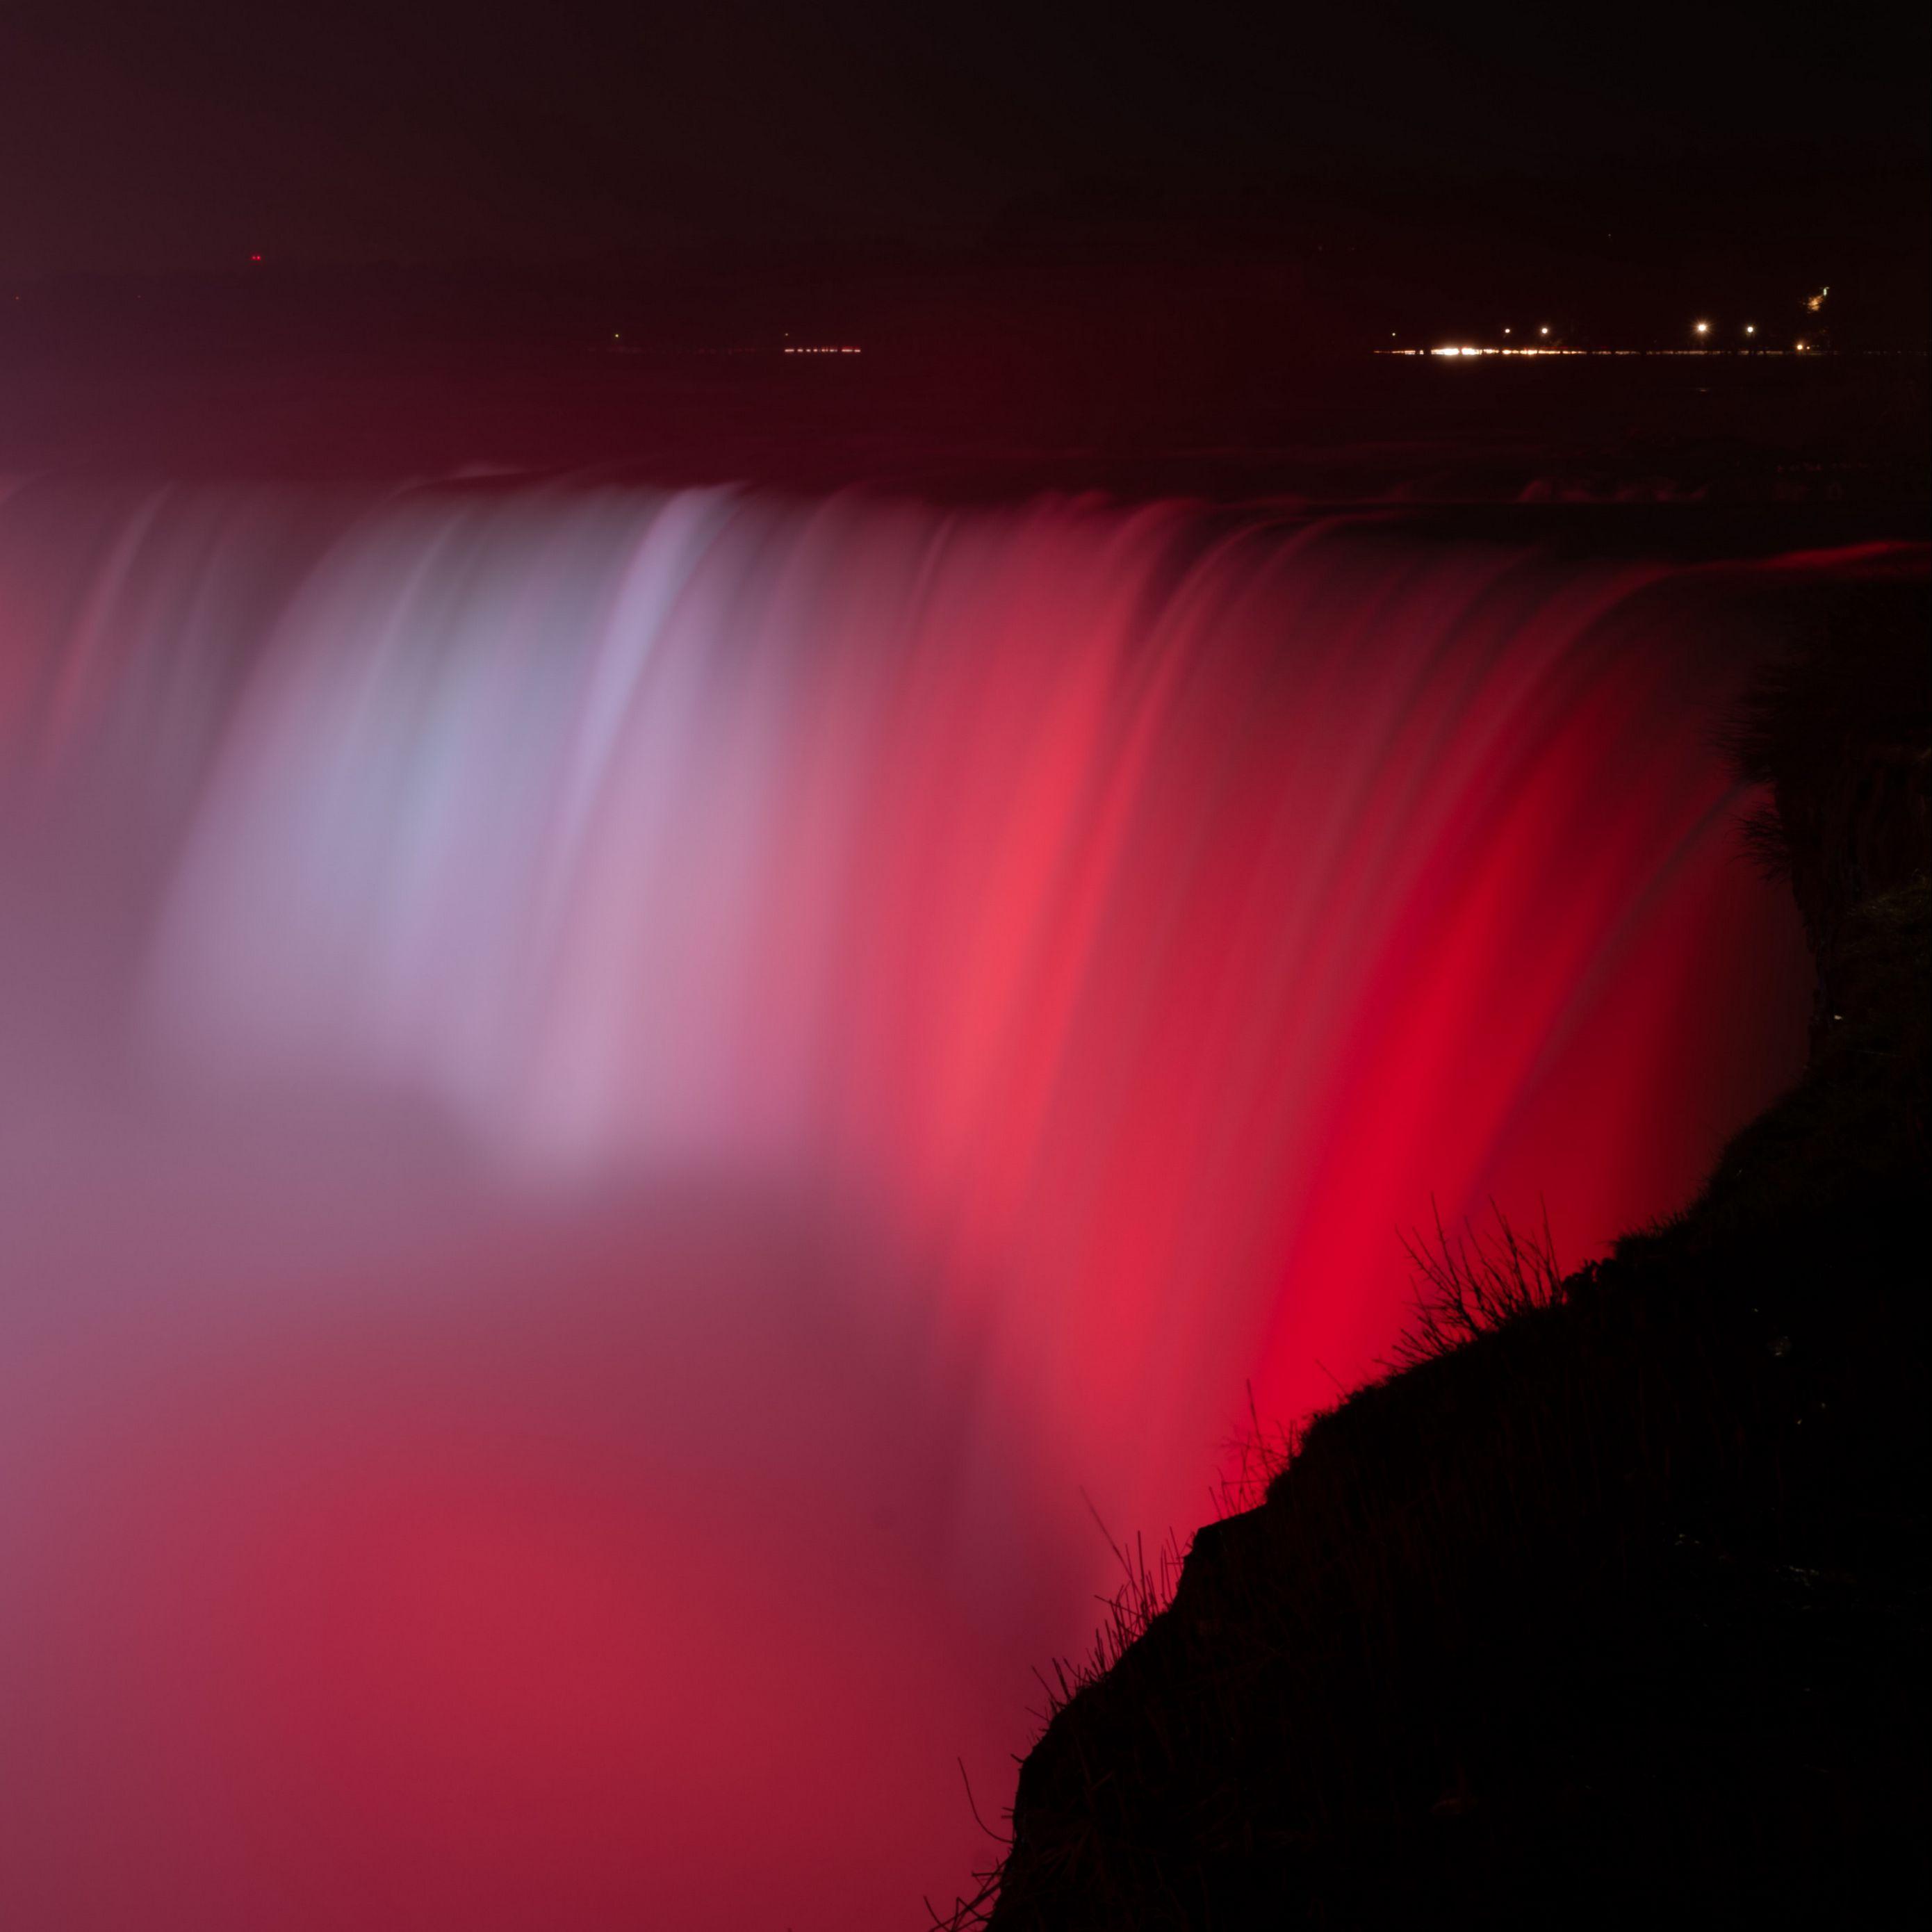 2780x2780 Wallpaper waterfall, fog, backlight, red, dark